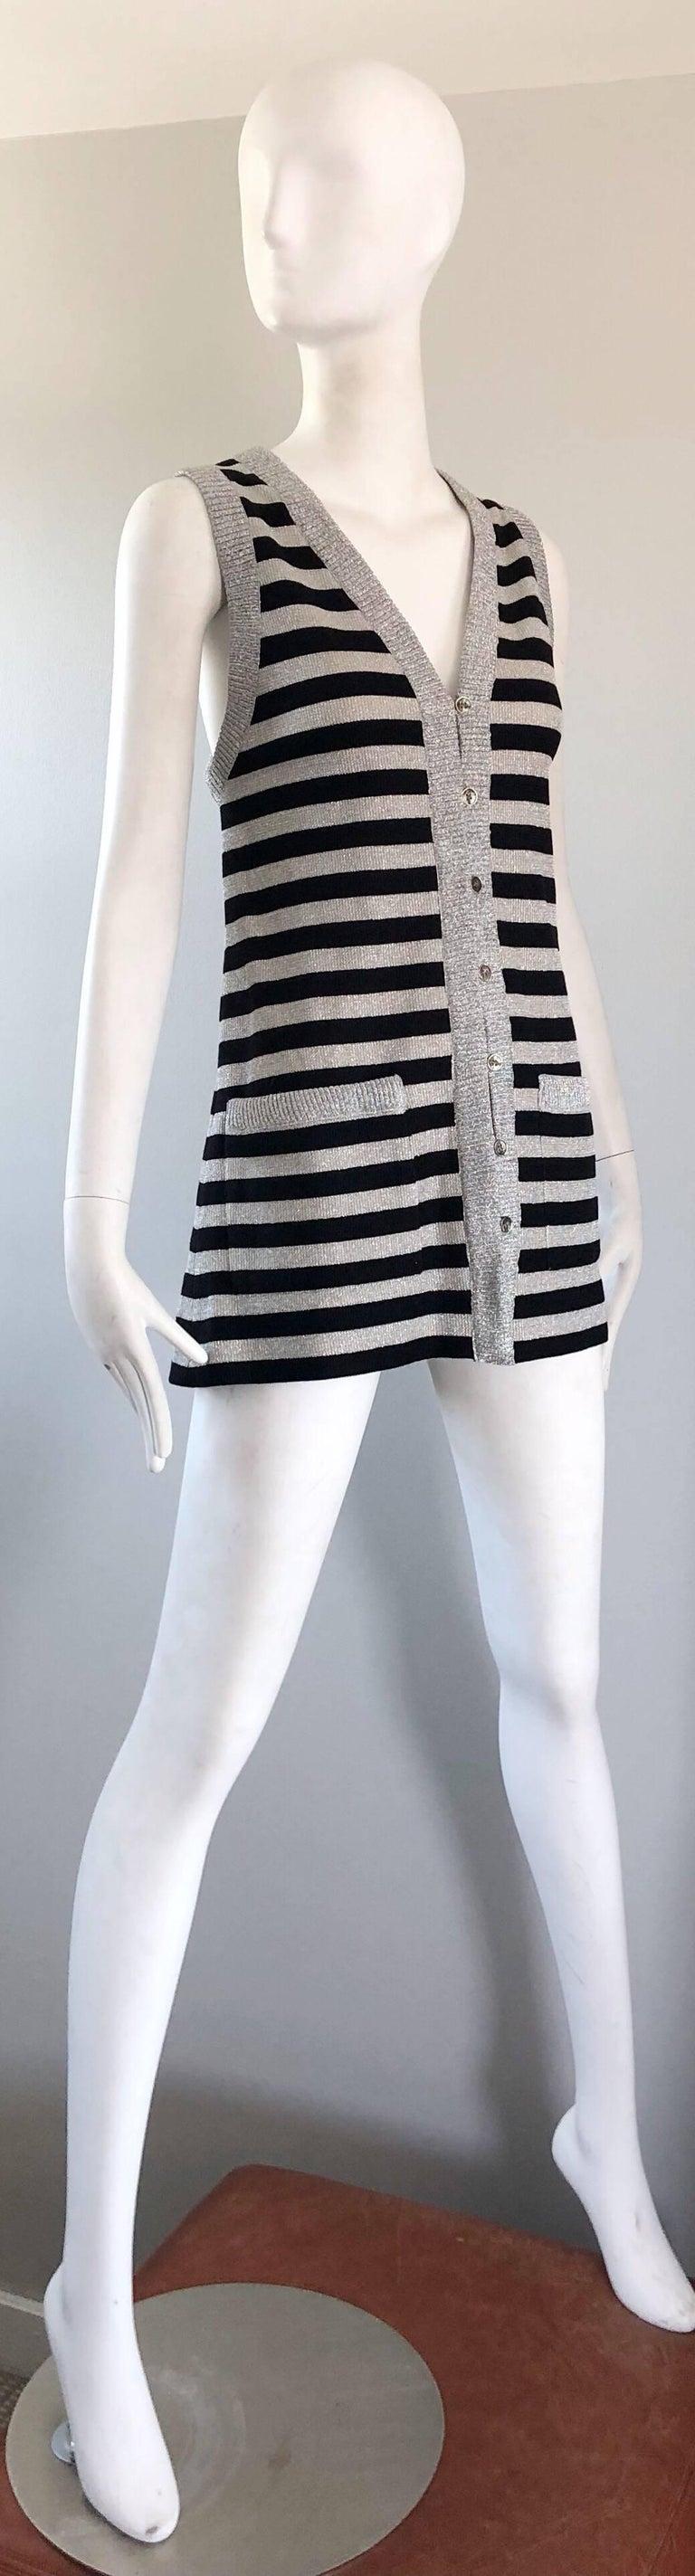 1970s Silver + Black Metallic Striped Sleeveless Vintage Vest Tunic / Mini Dress For Sale 1